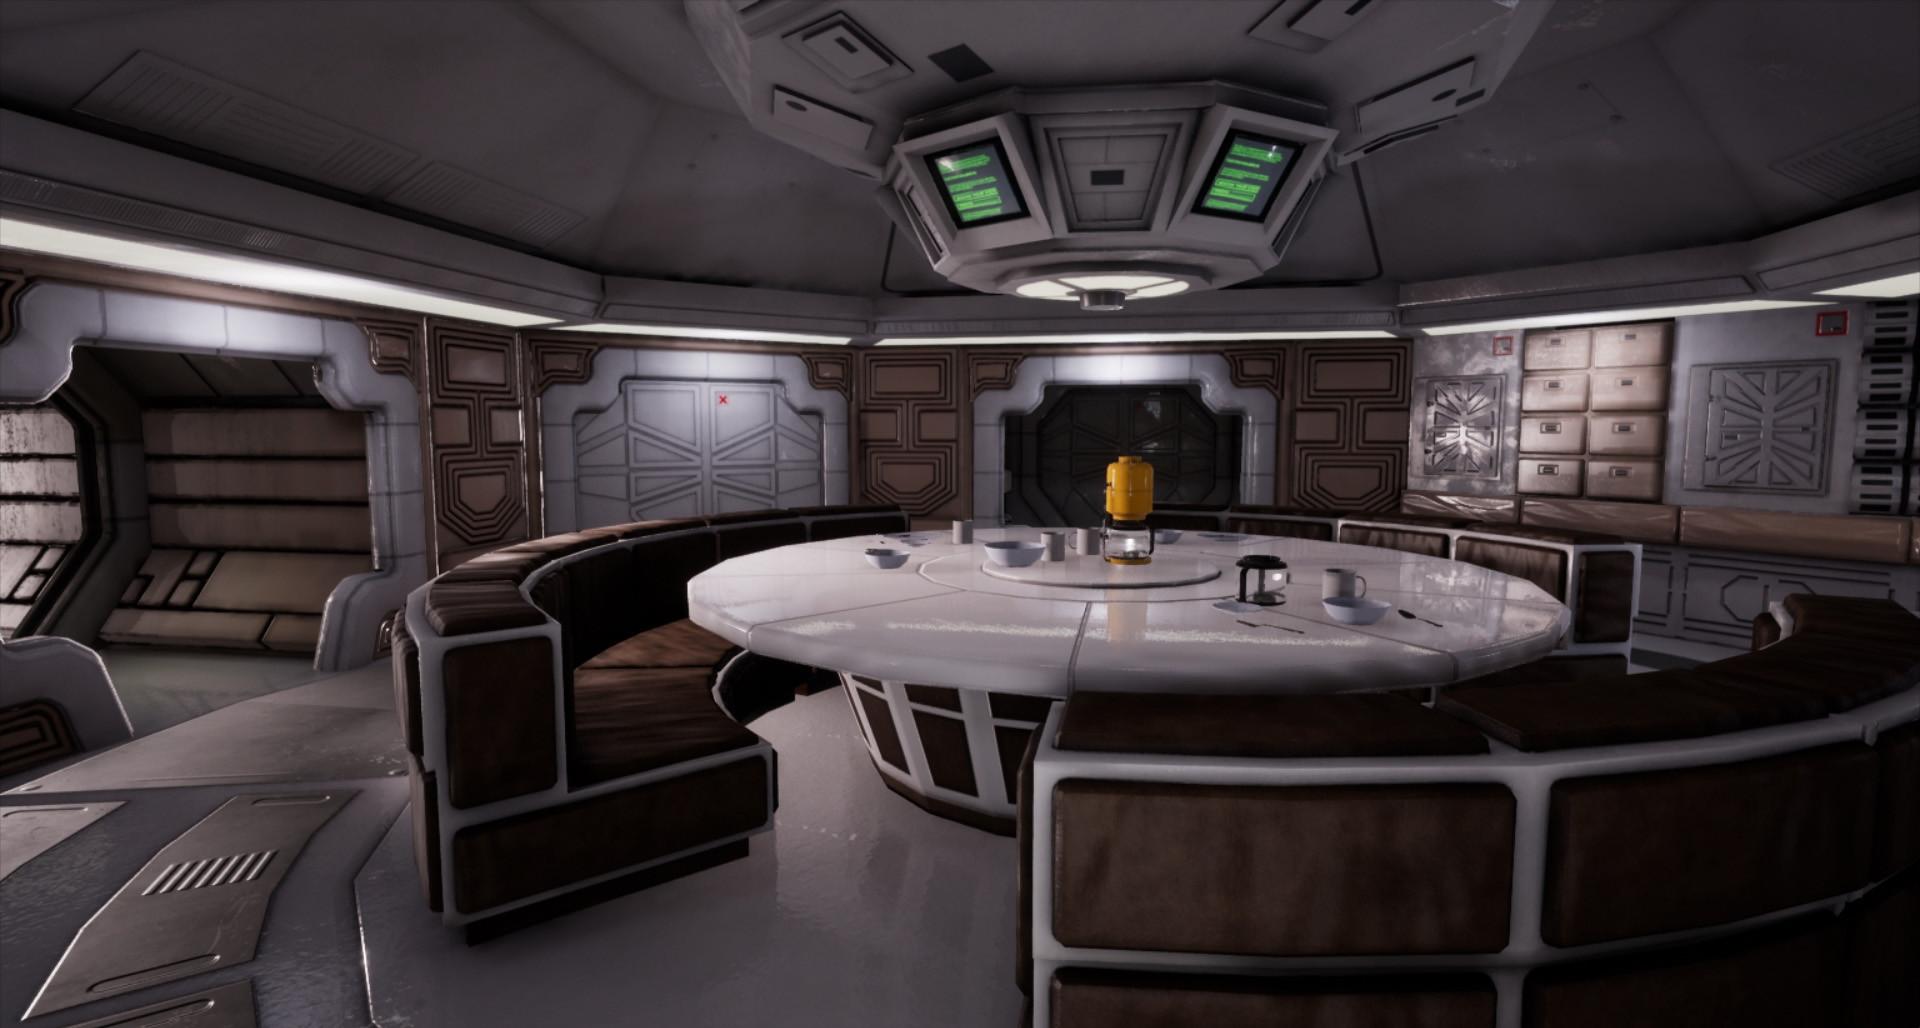 ArtStation  Alien Nostromo Kitchen Kimberly Wagner